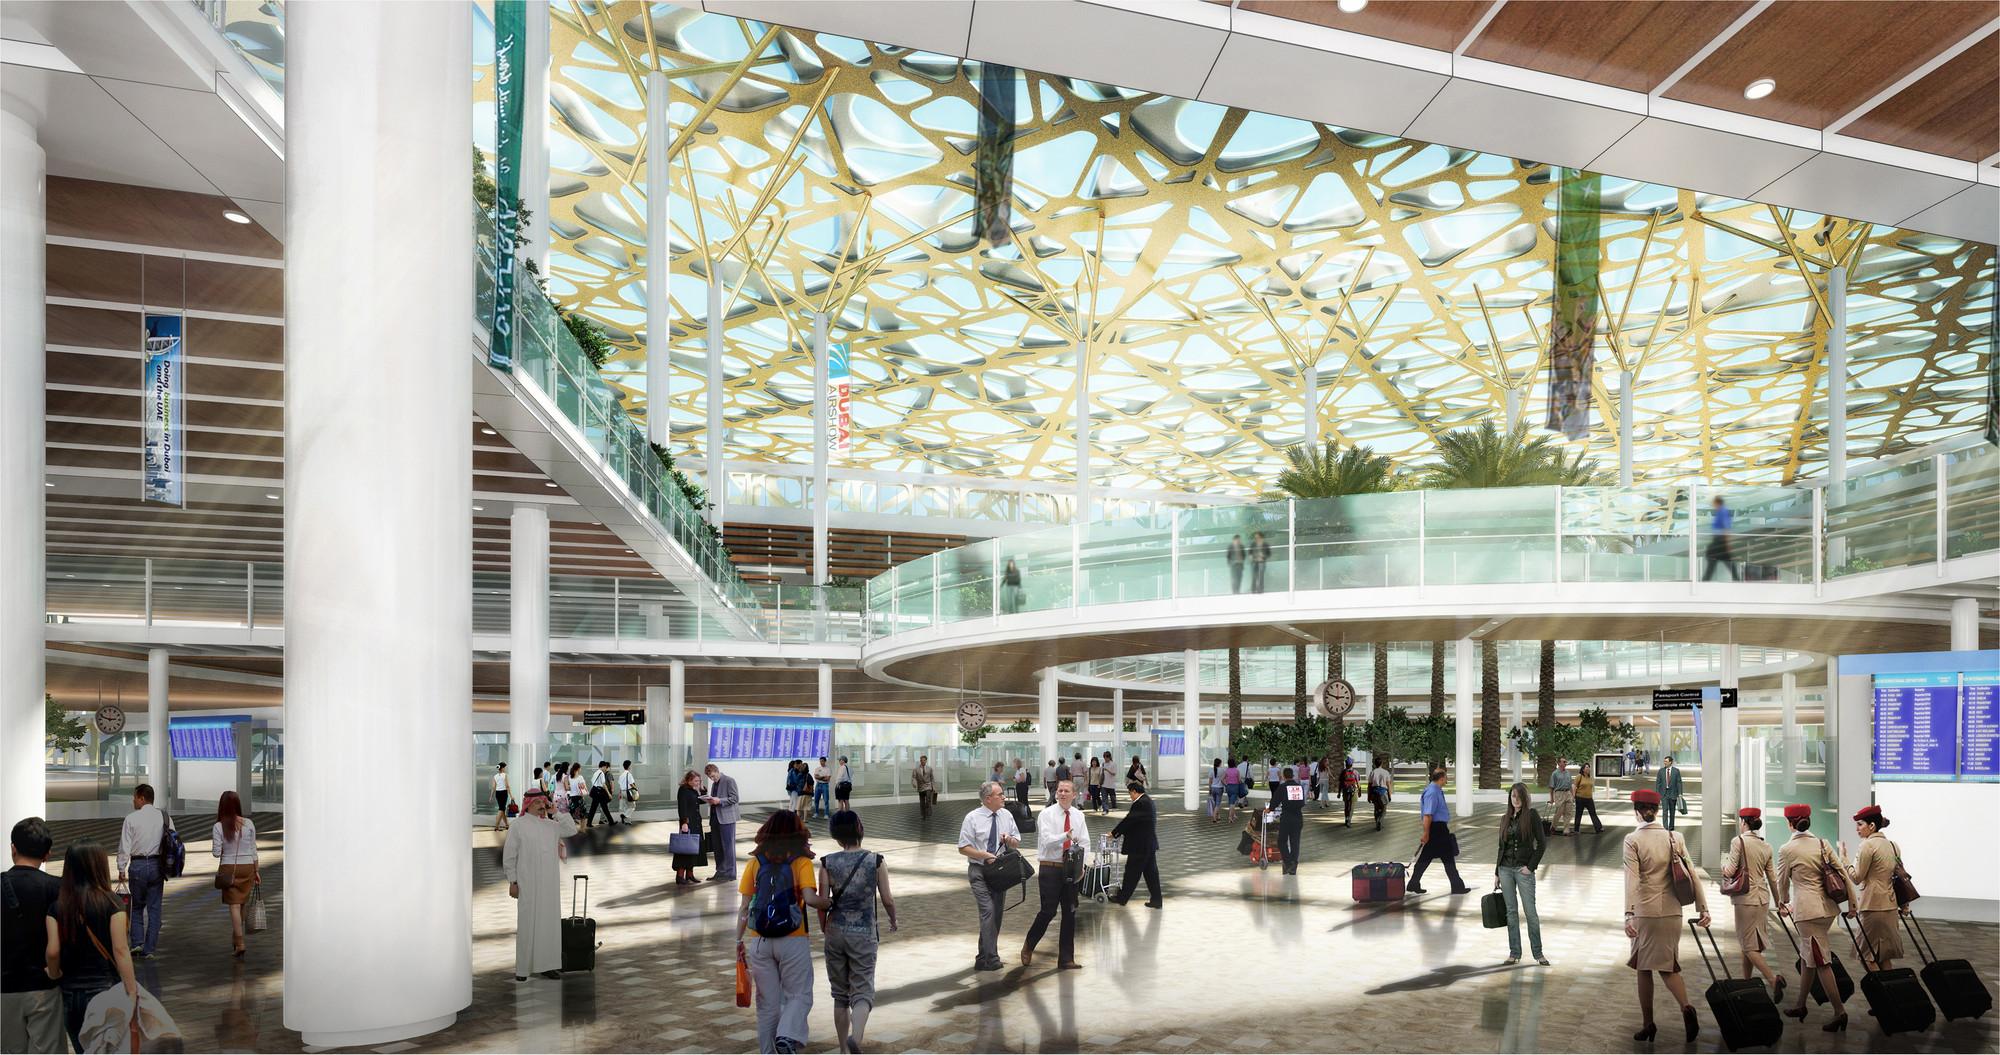 Leslie Jones Architecture To Design International Airport